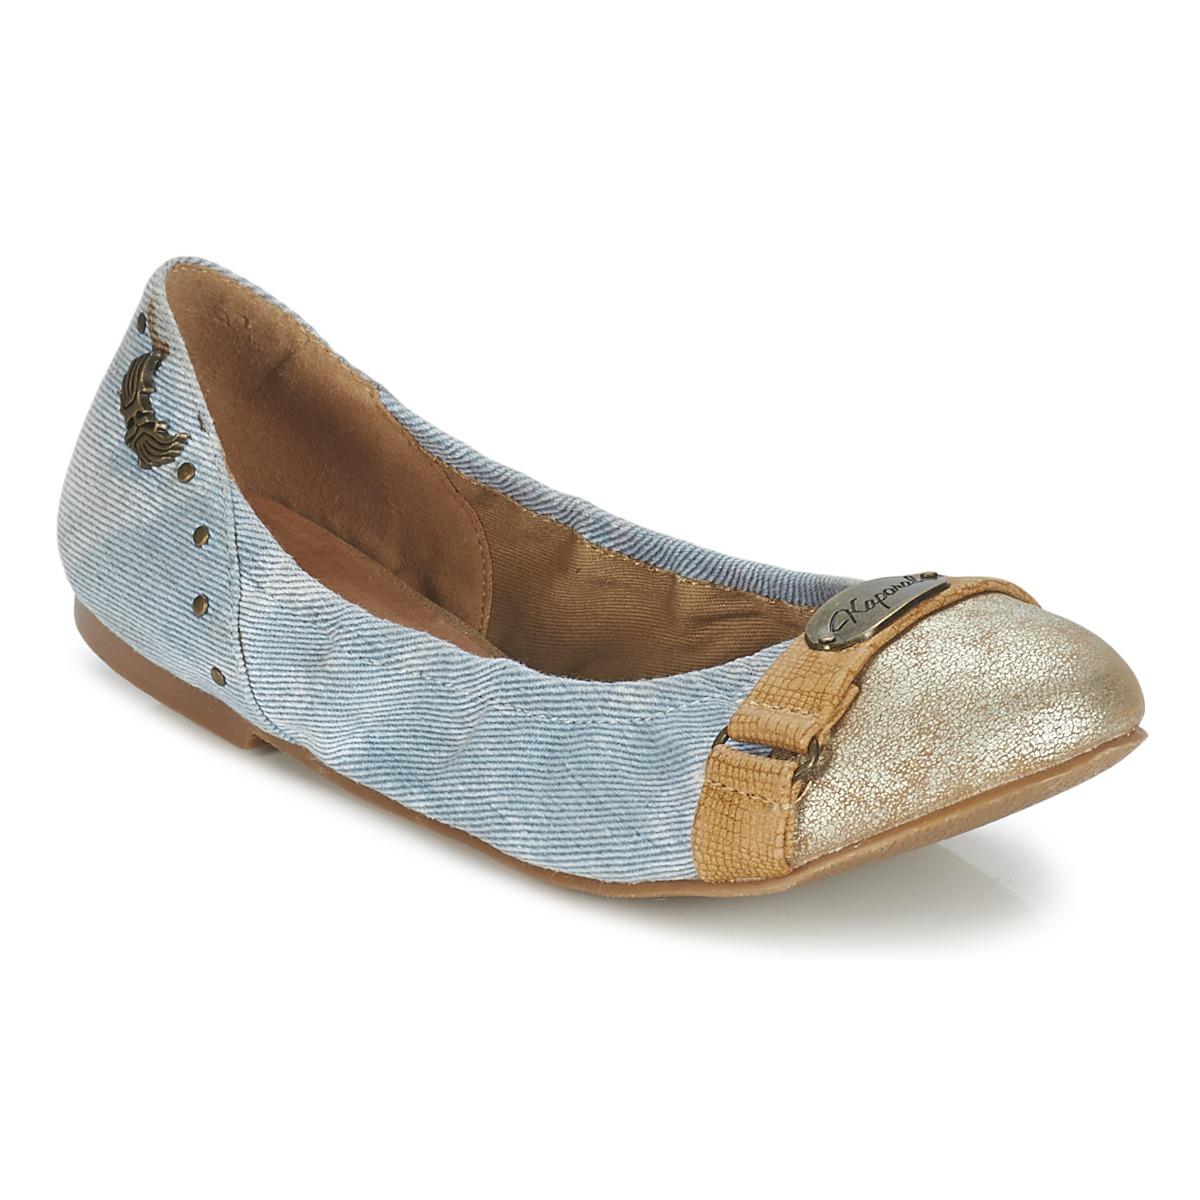 kaporal dory bleu denim chaussure pas cher avec chaussures ballerines femme 19 50. Black Bedroom Furniture Sets. Home Design Ideas